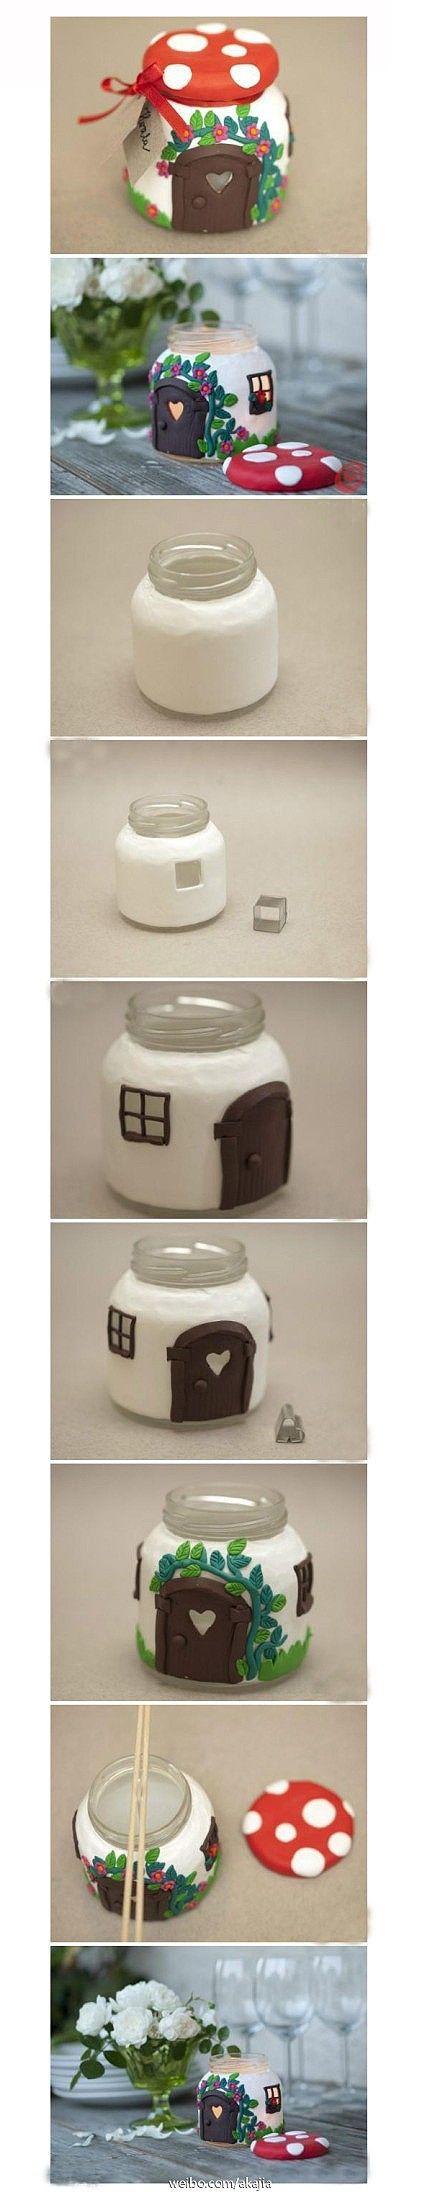 Meng things handmade DIY / baby handmade art design Aka: # diy # handmade mushroom hut waste of ... - ink ...